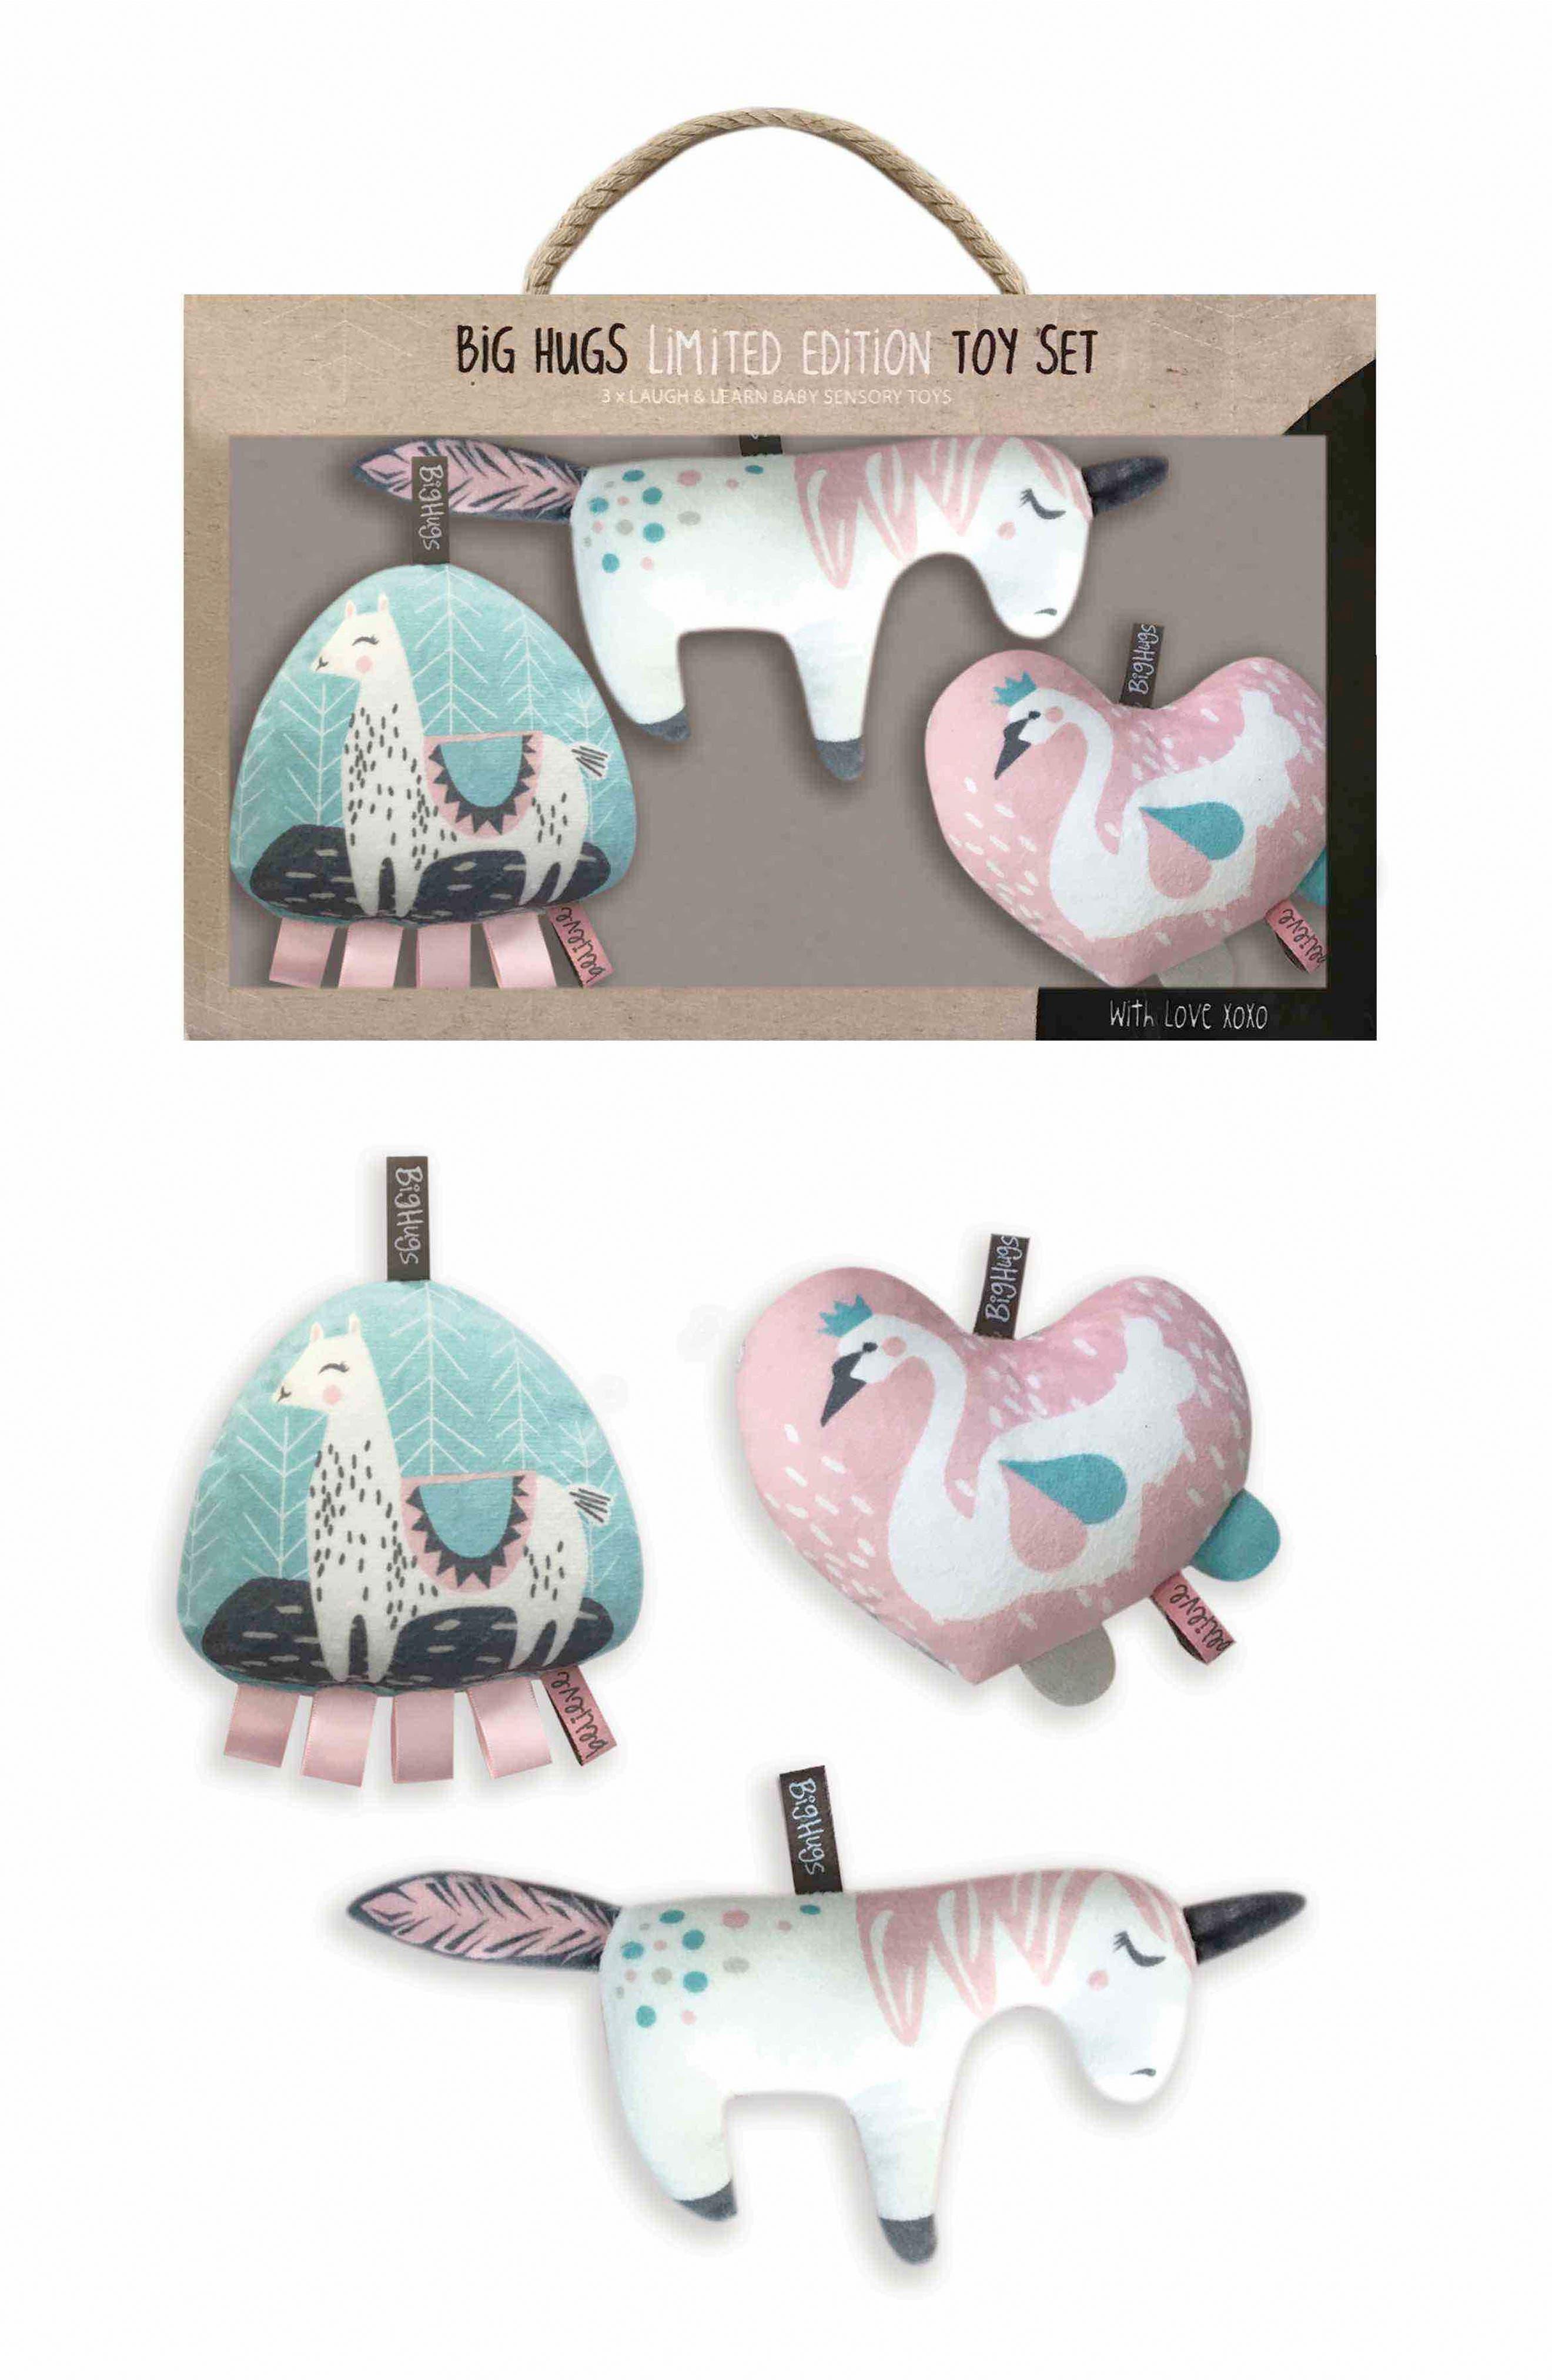 Sweet Romance Activity Plush Toys Set,                             Main thumbnail 1, color,                             PINK/ AQUA/ TAUPE